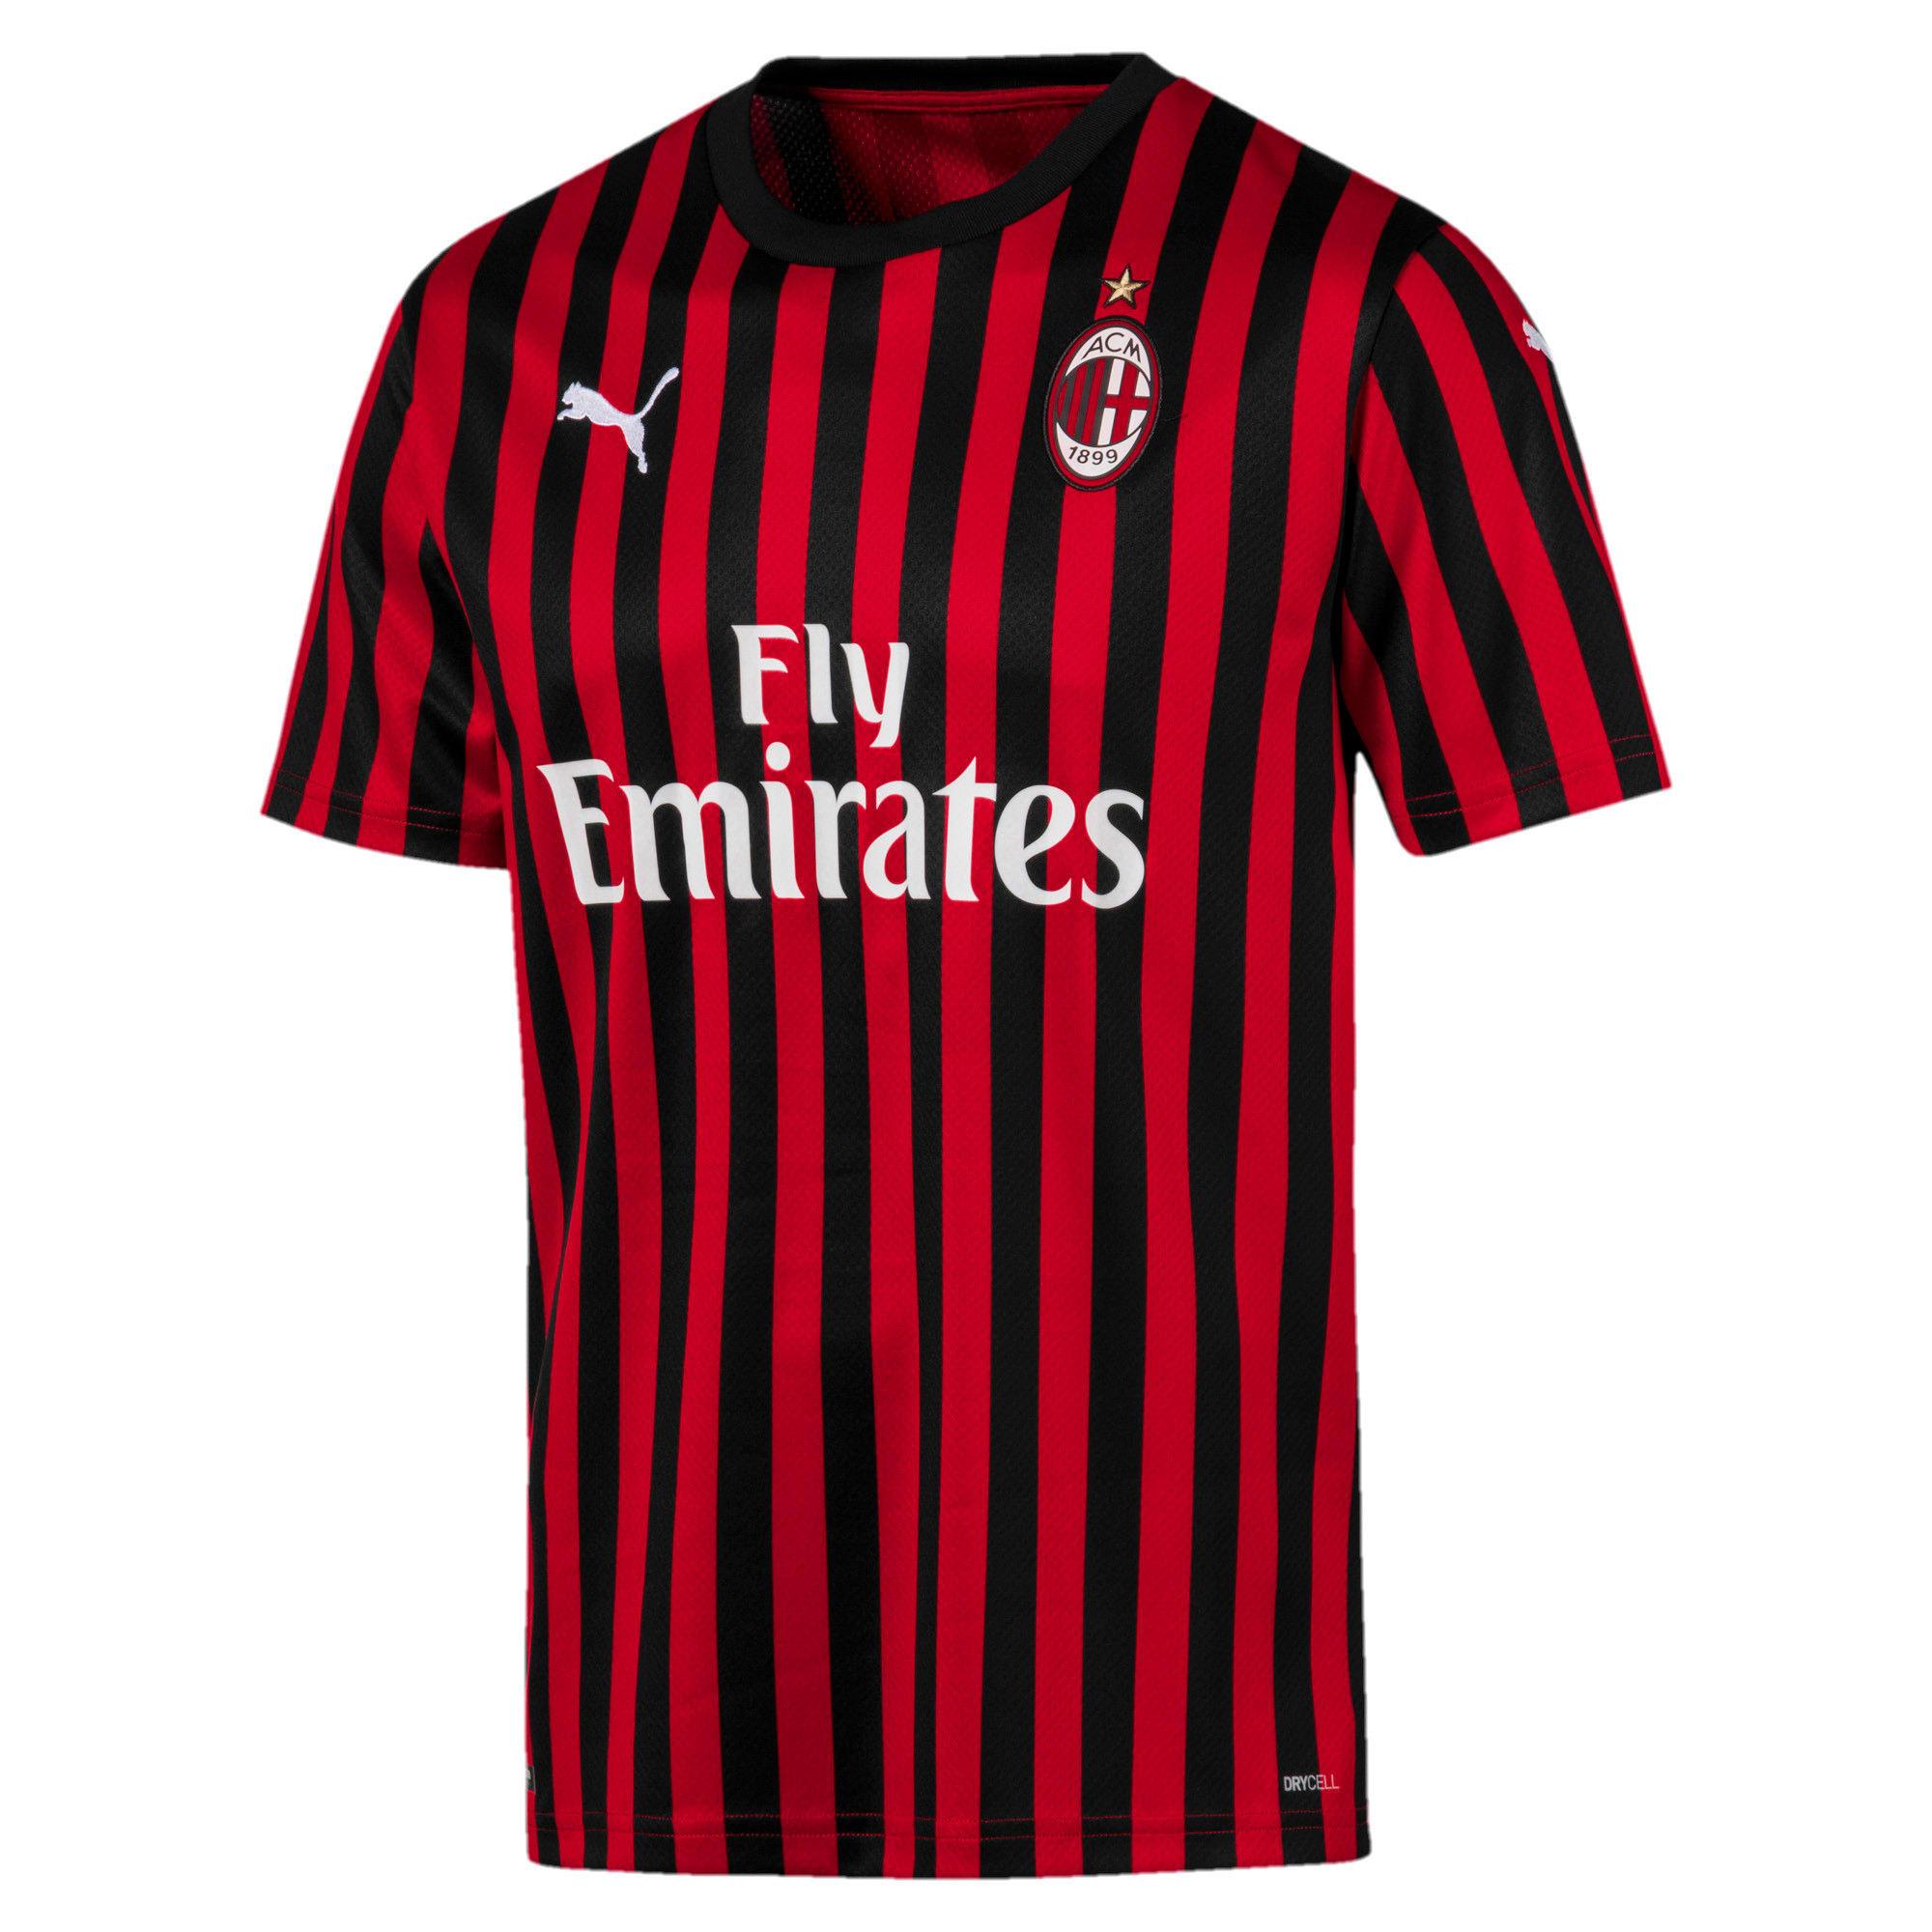 Thumbnail 4 of AC Milan Men's Home Replica Jersey, Tango Red -Puma Black, medium